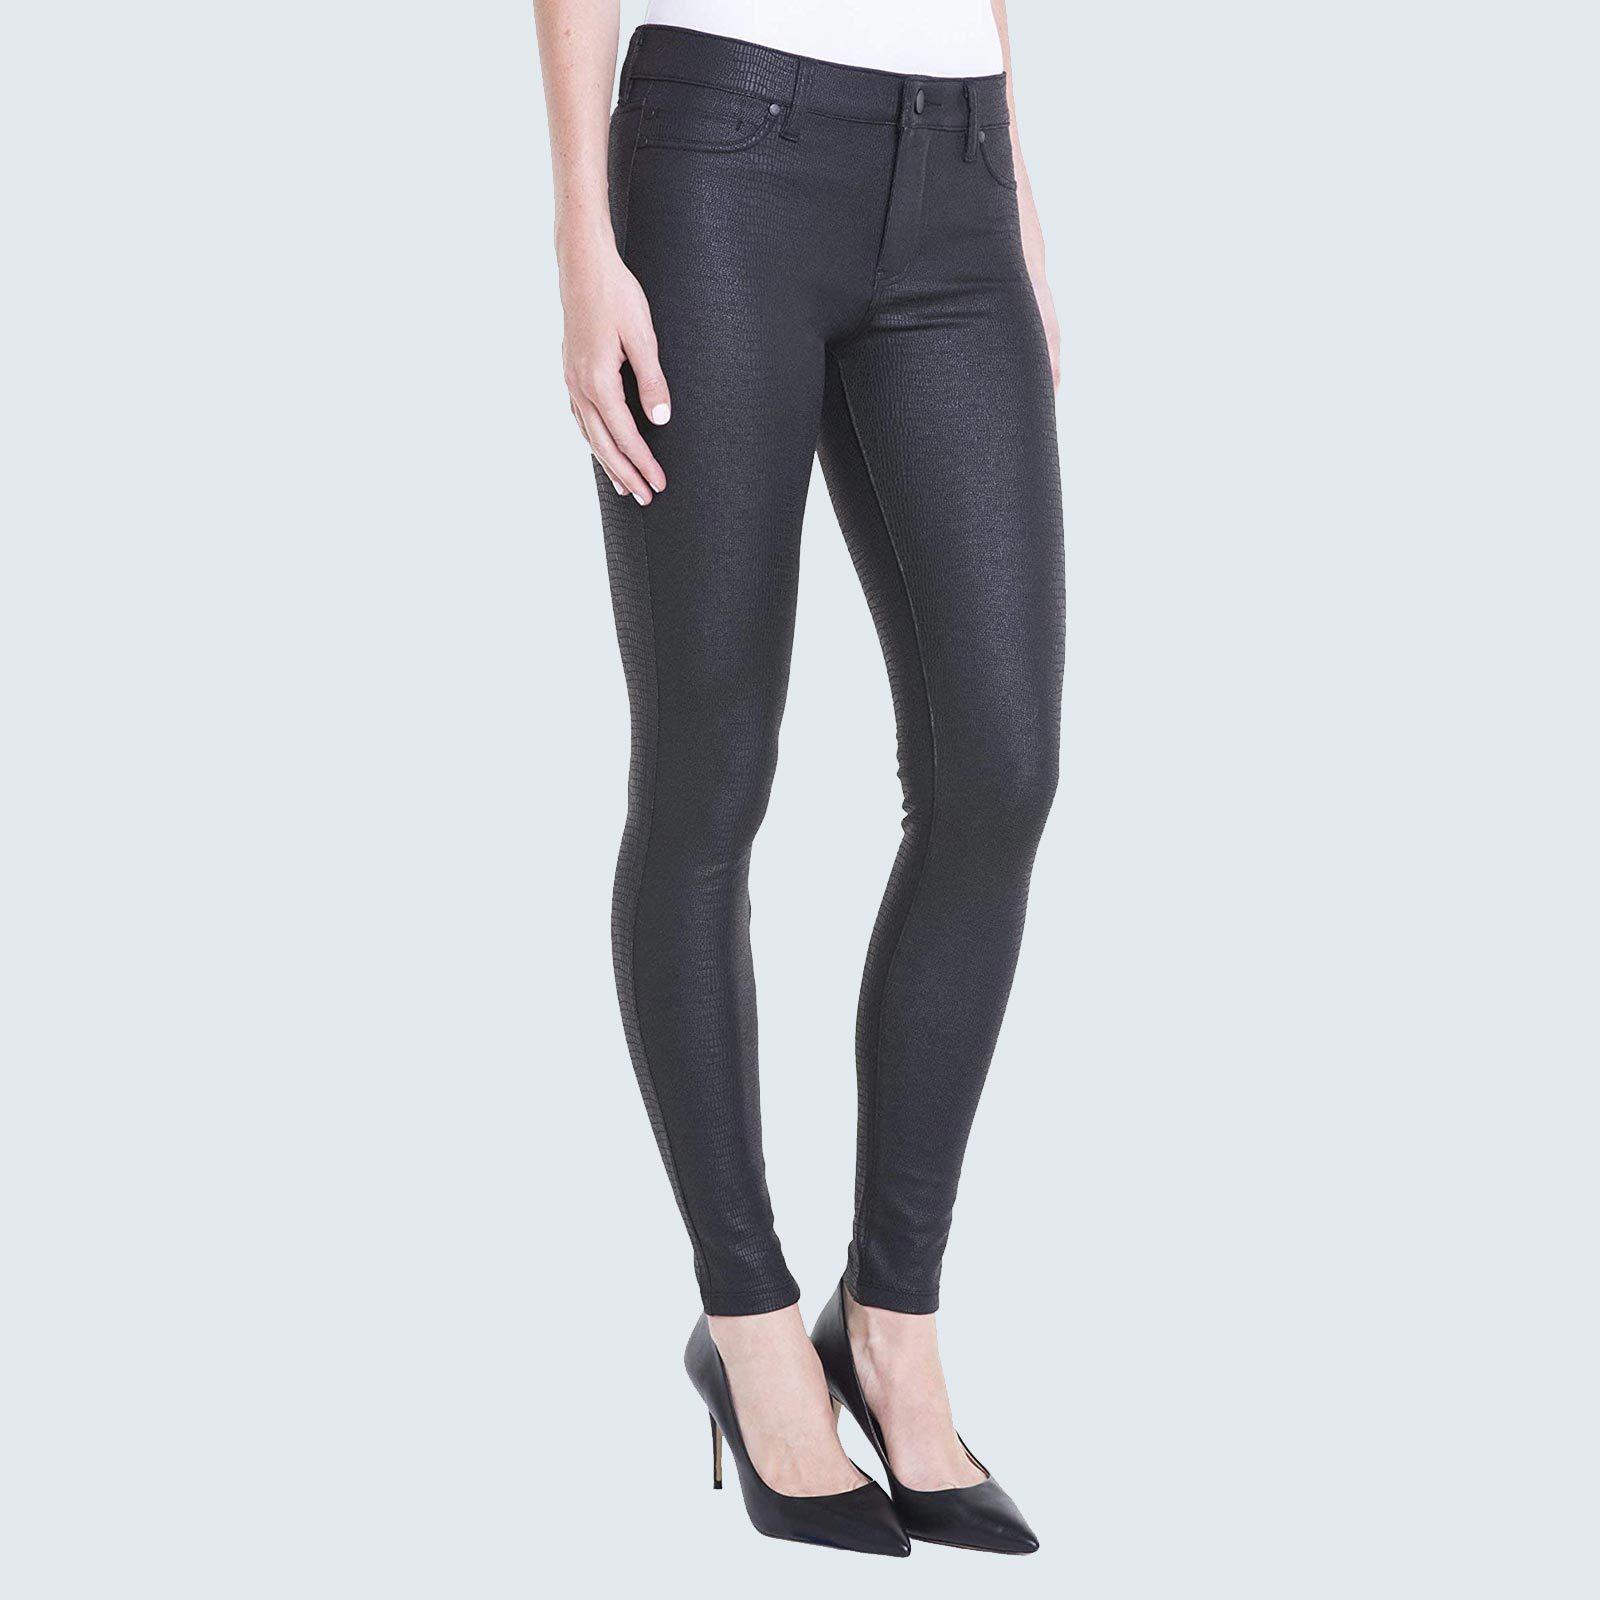 Best fashion leggings for petite sizes: Liverpool Petite Madonna Leggings